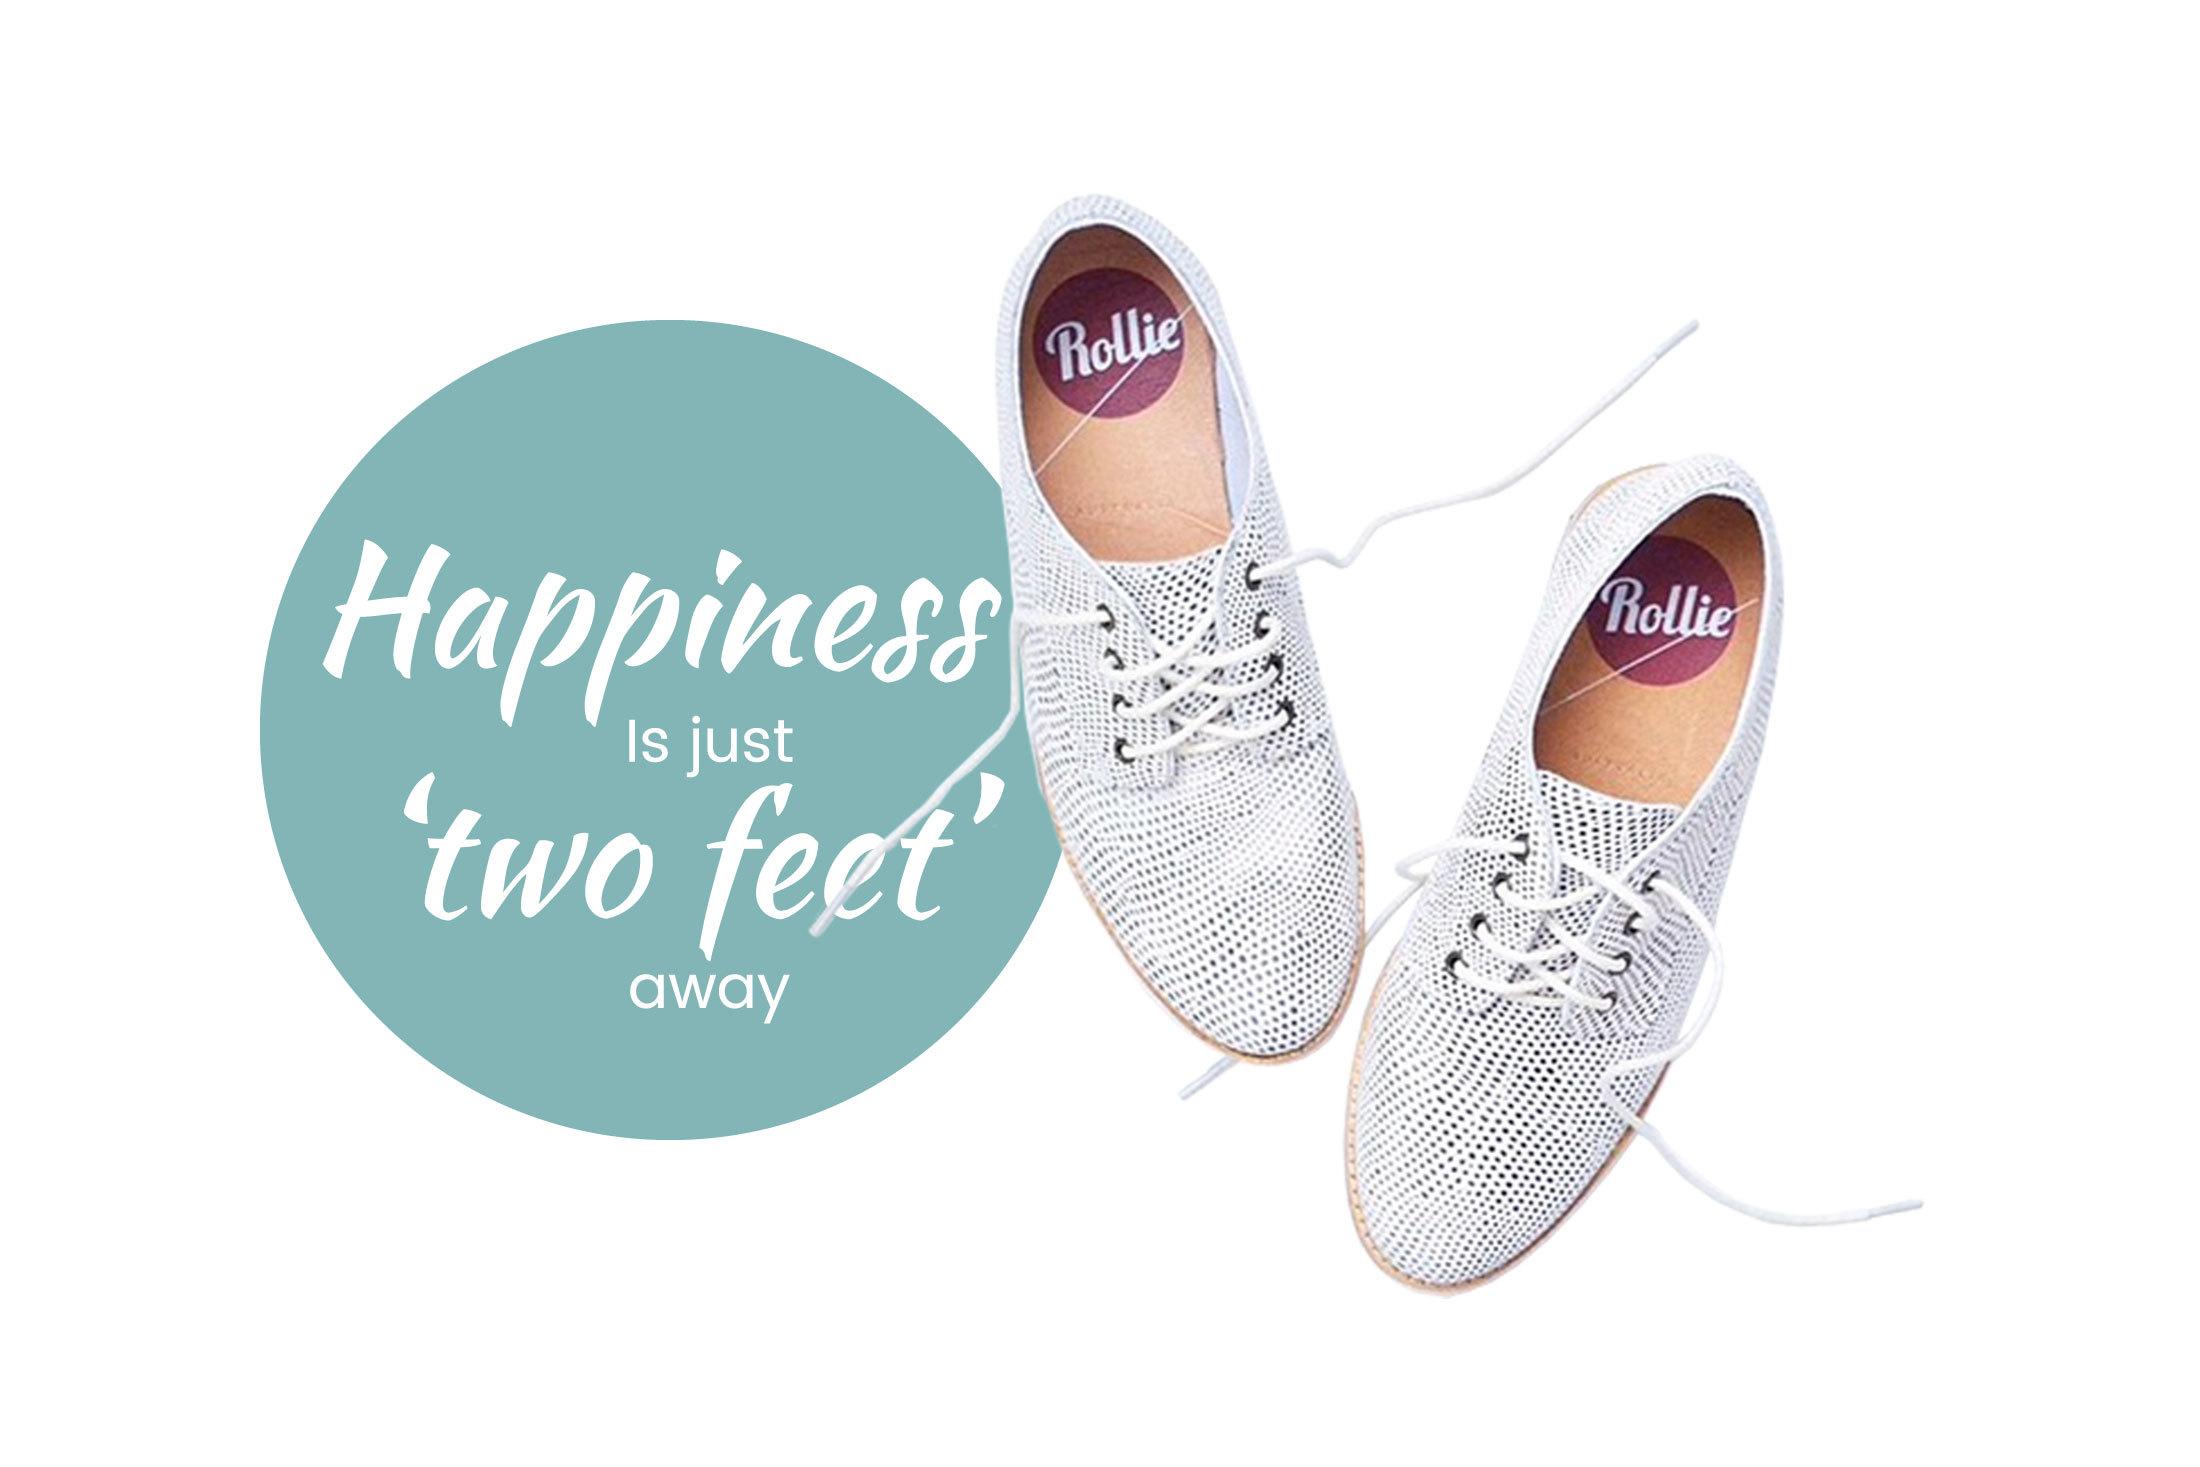 Rollie-schoenen-Happiness-two-feet-away